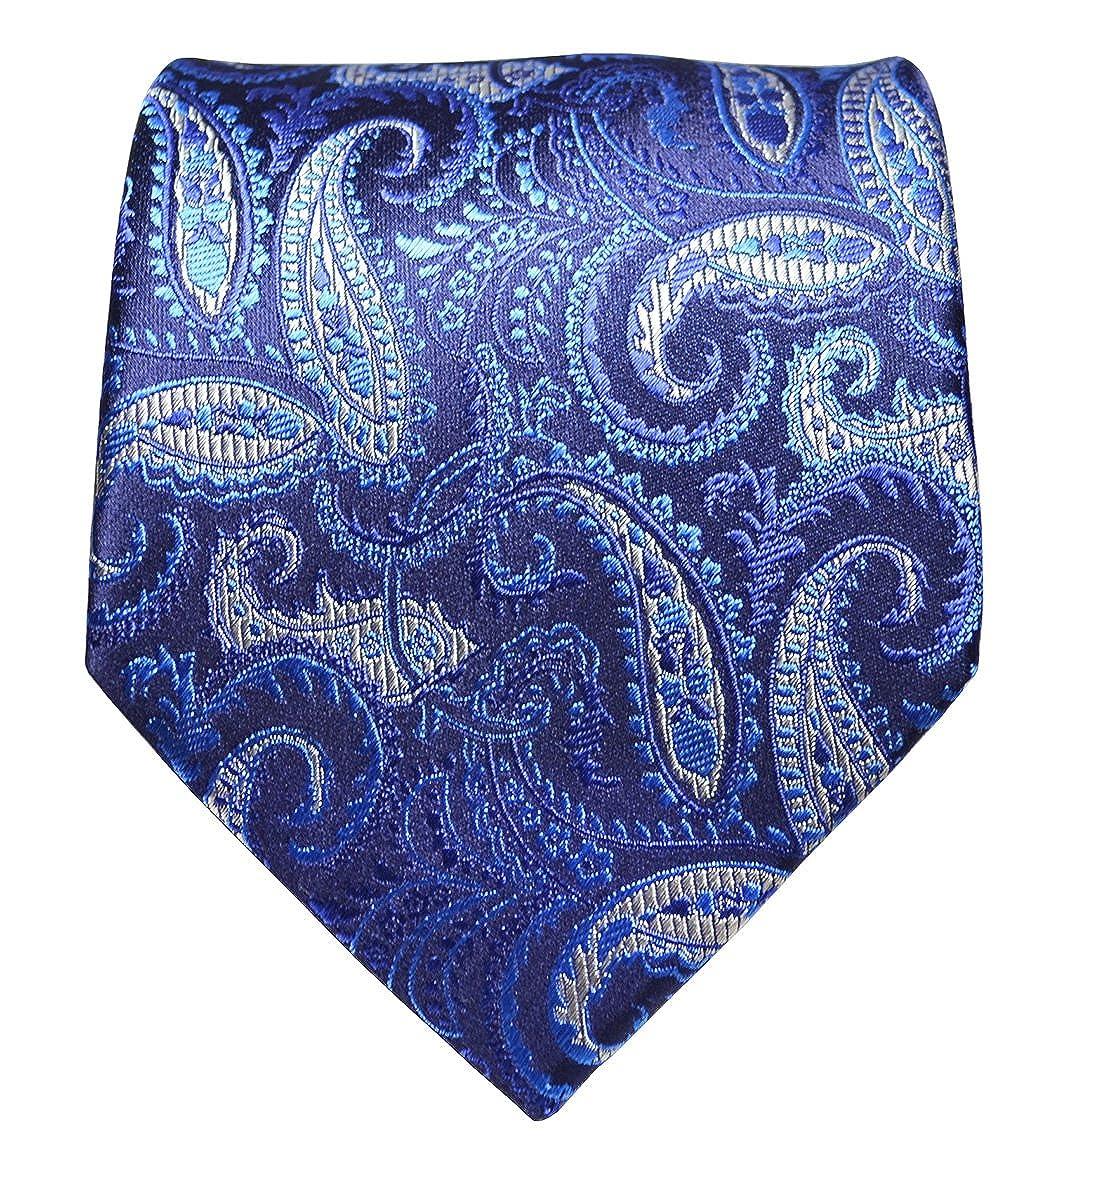 Pocket Square and Cufflinks Blue Paisleys Paul Malone Extra Long Silk Necktie